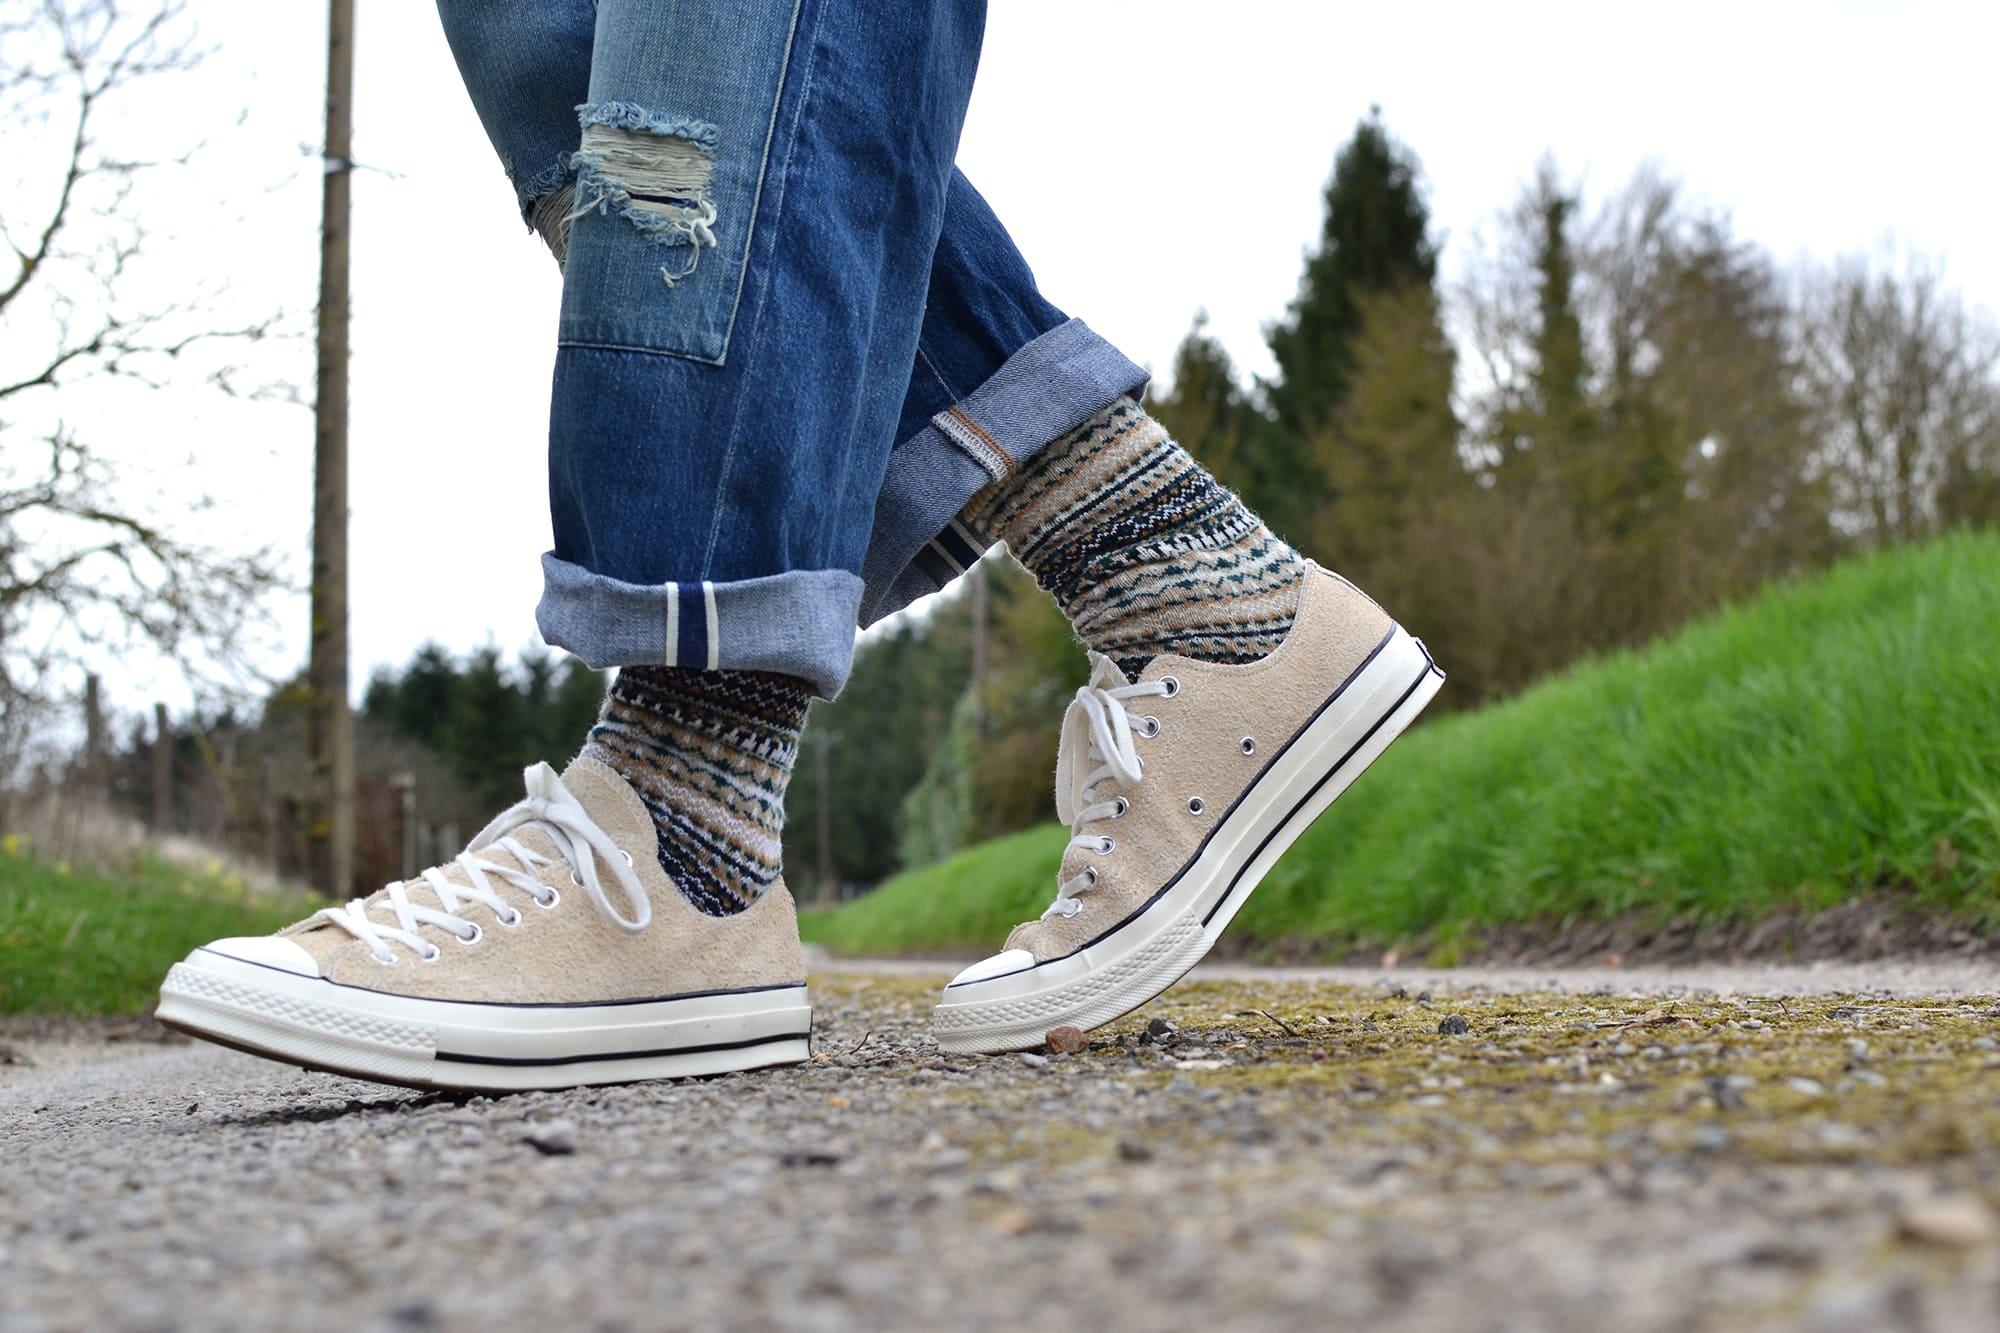 reputable site 2266e 4501c blog mode homme street heritage japan wear – – 14Vetra Work Jacket –  DOckers x Patrik Ervell shirt -Levi s vintage clothing 915 501 big E jeans  – Converse ...